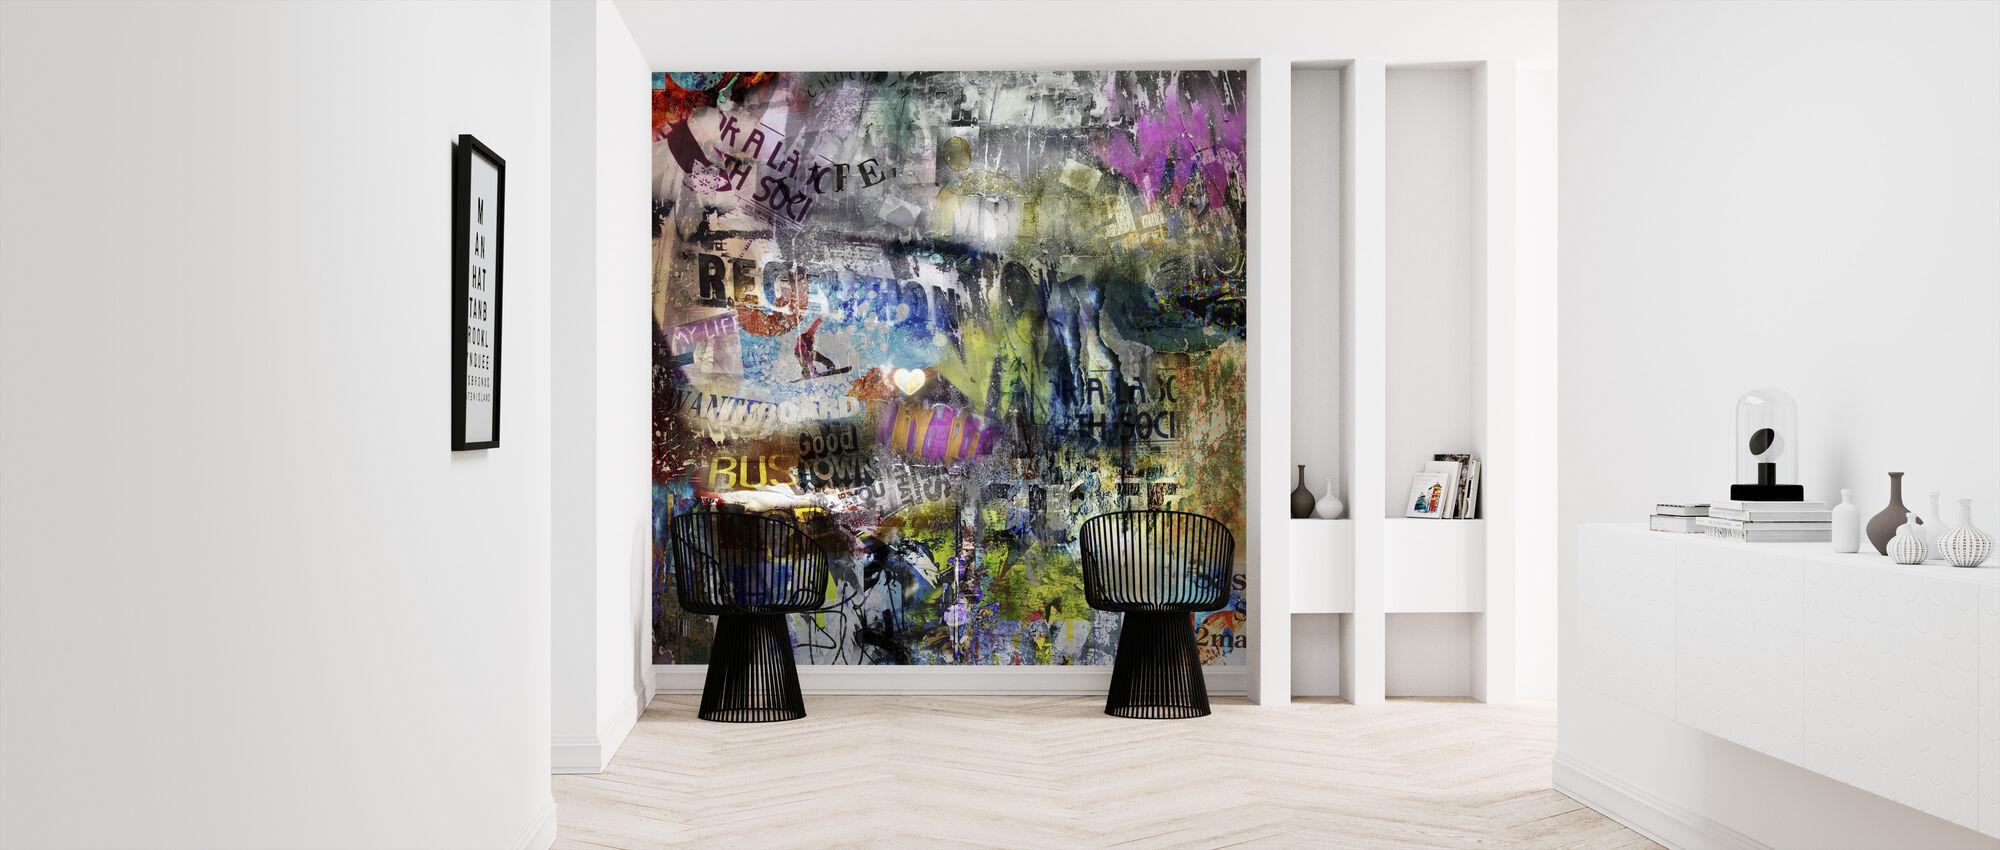 Torn Posters - Wallpaper - Hallway